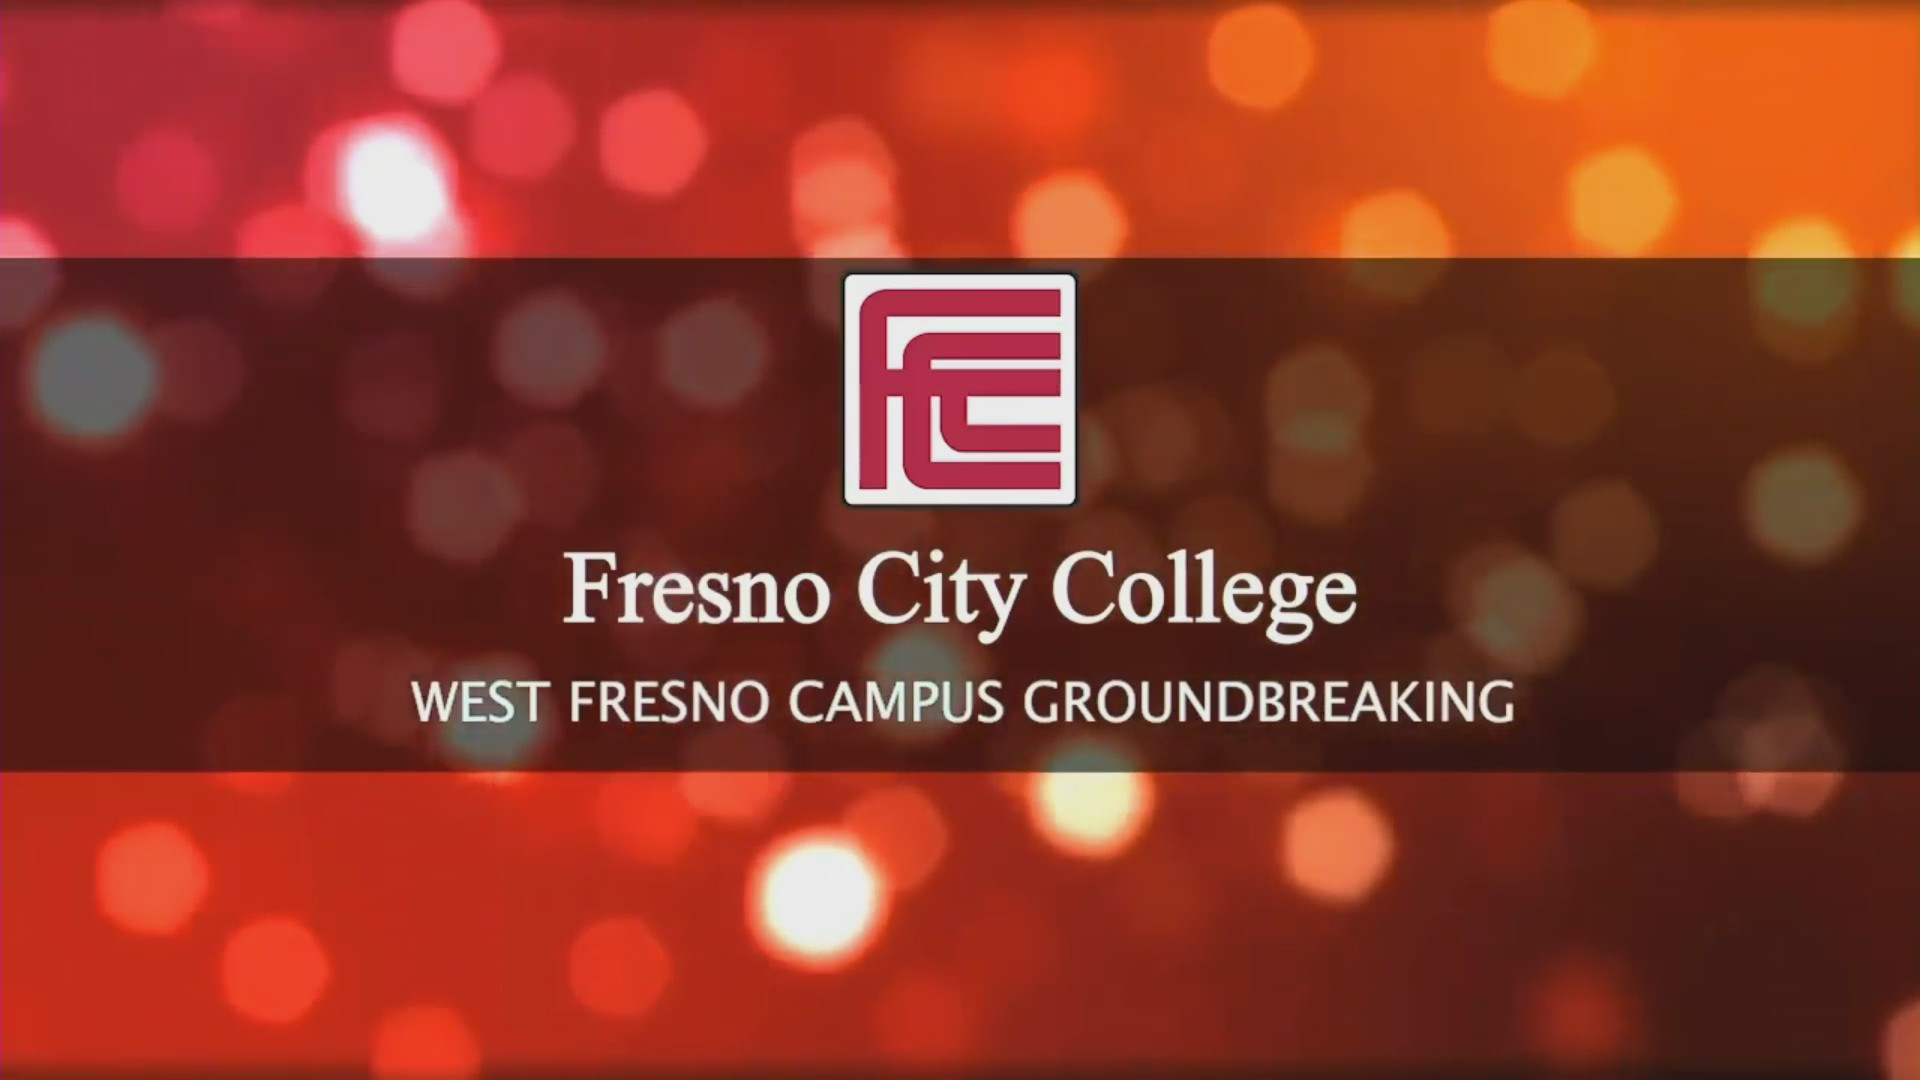 Fresno City Halloween 2020 Fresno City College breaks ground on 'Historic' new West Fresno